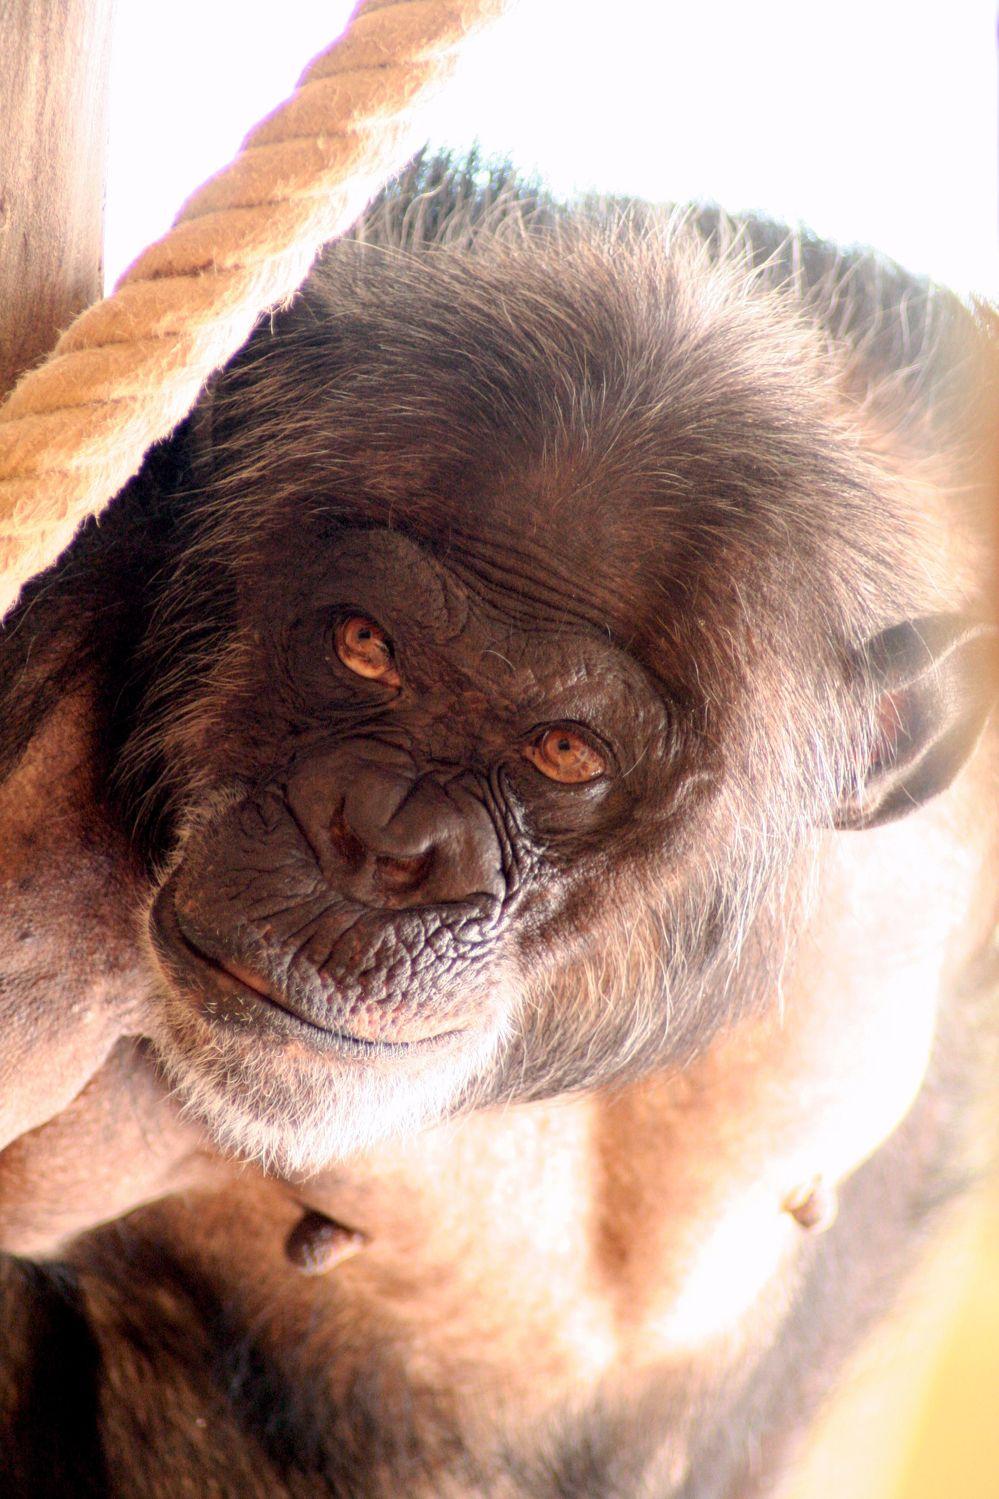 Bild mit Tiere, Säugetiere, Primaten, Menschen, Körperteile, Haut, Menschenaffen, Schimpansen, Makaken, Affe, Menschenaffe, Tier, Pan, Bonobo, Zwergschimpanse, Hominidae, Pan troglodytes, Pan paniscus, Orang Utans